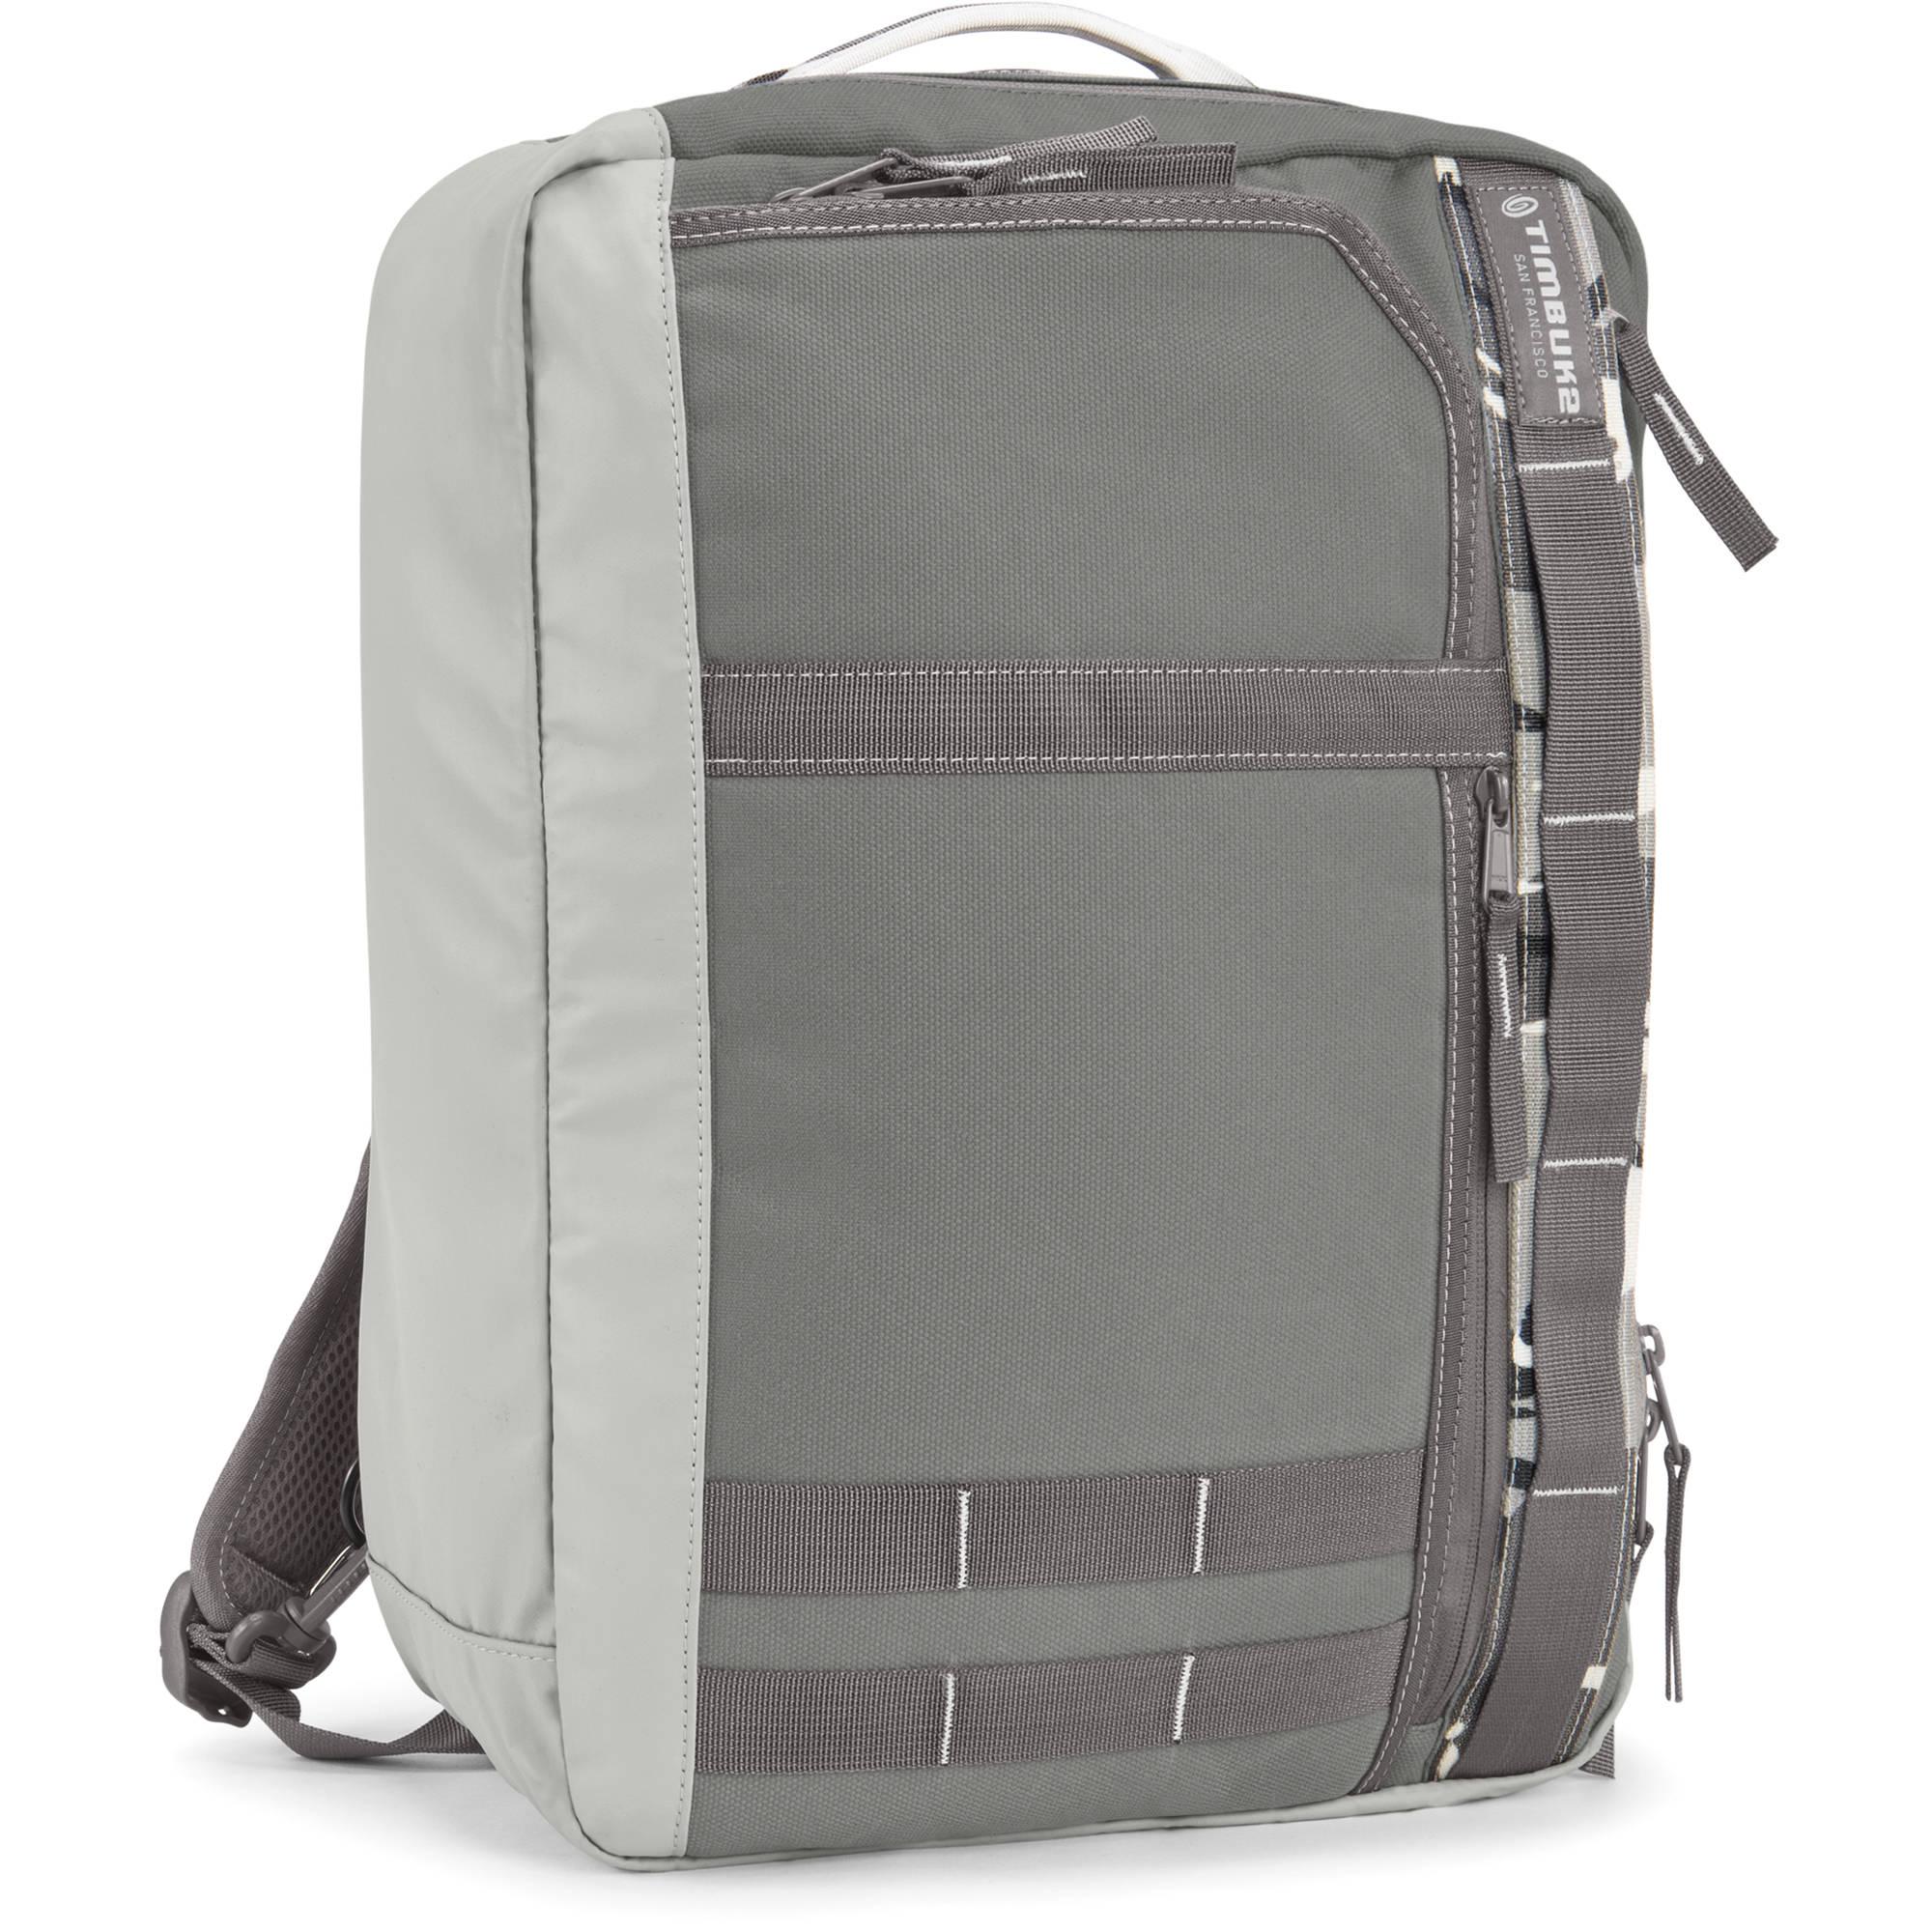 ecd6e64ec63 Timbuk2 Ace Laptop Backpack Messenger Bag 354-4-2960 B H Photo